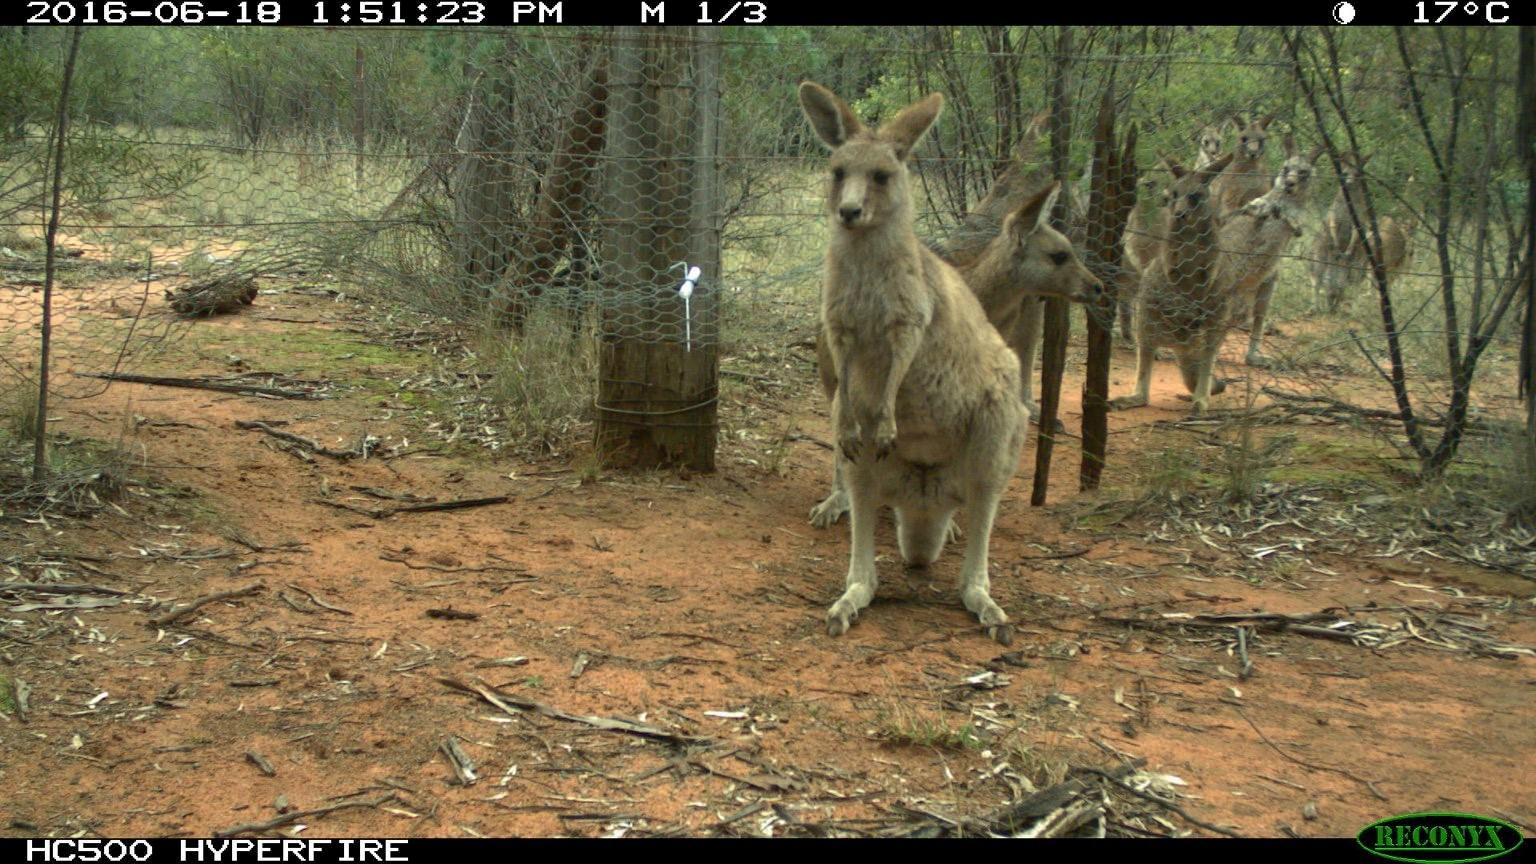 Kangaroo Lineup